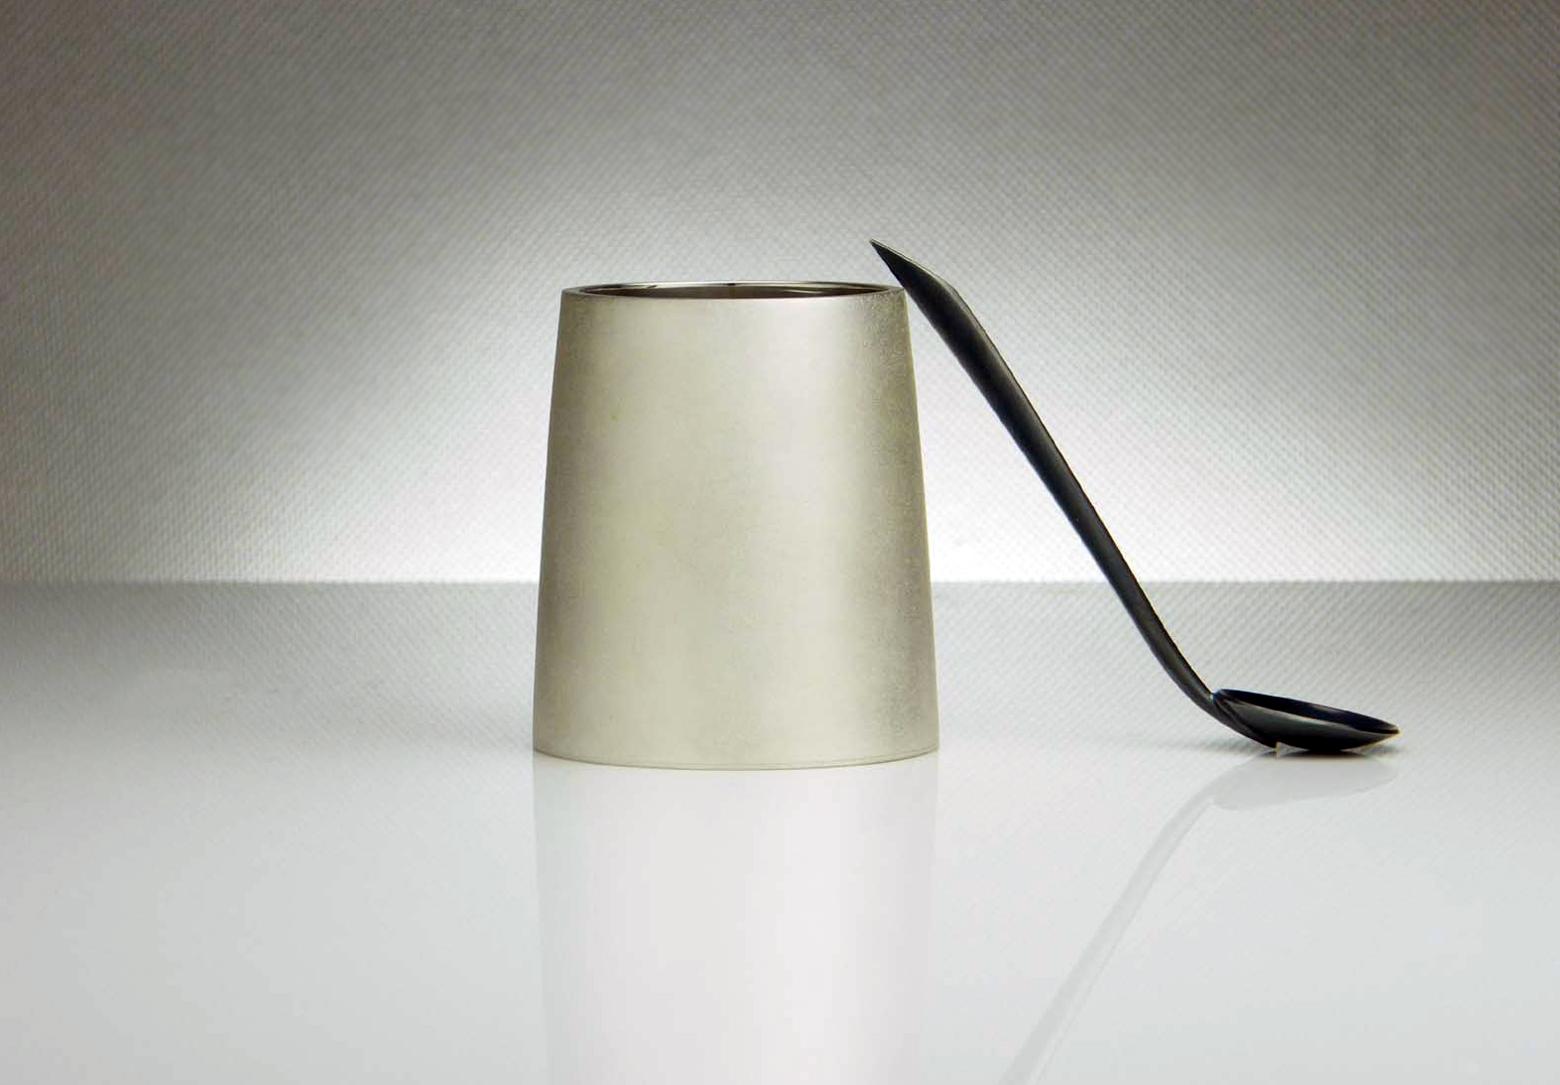 ARC Sugar Bowl & Spoon